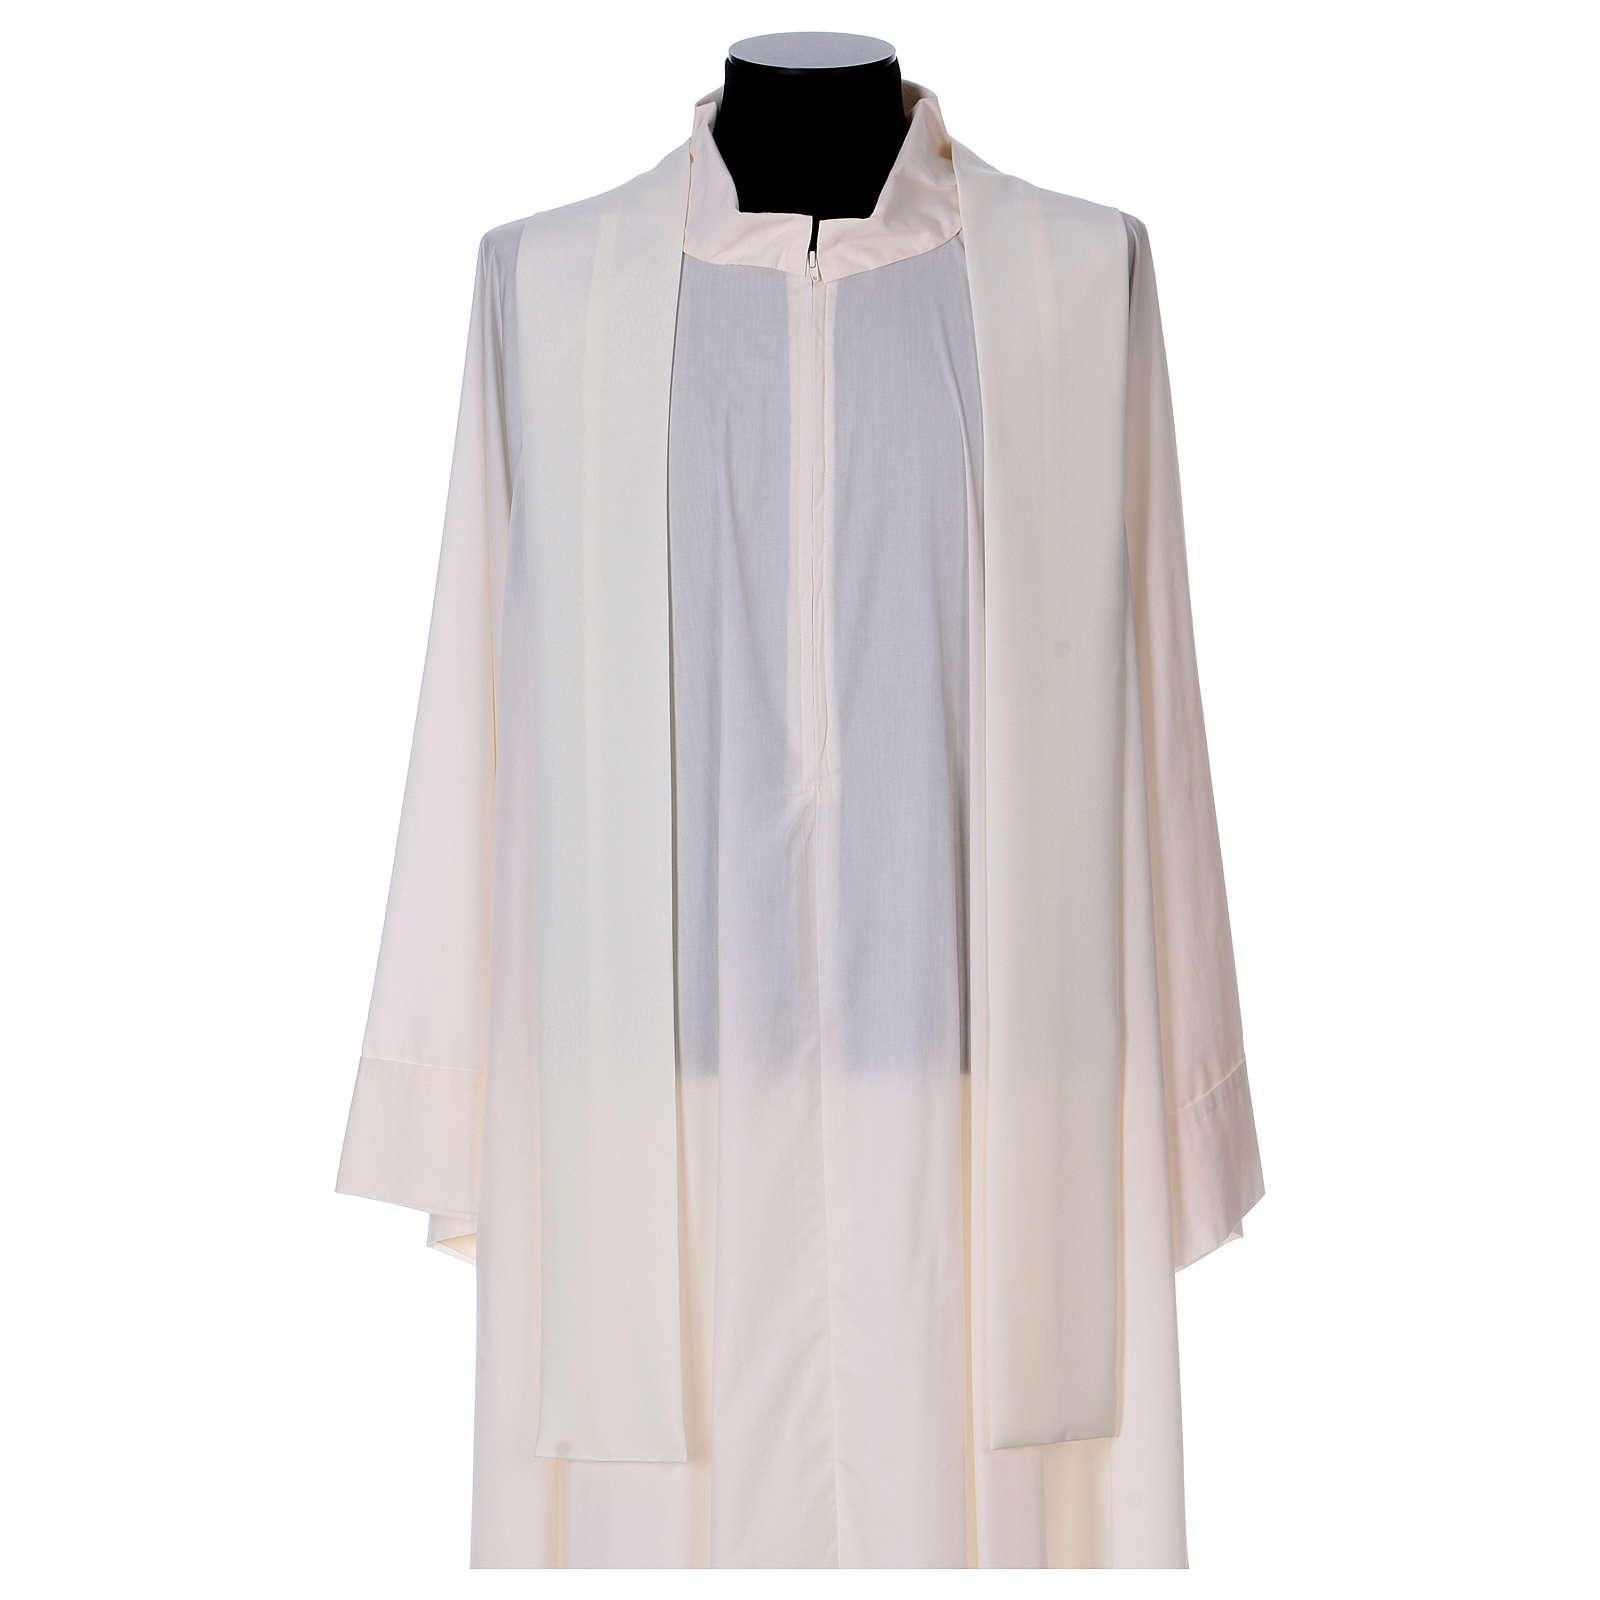 Casula mariana 100% poliestere 4